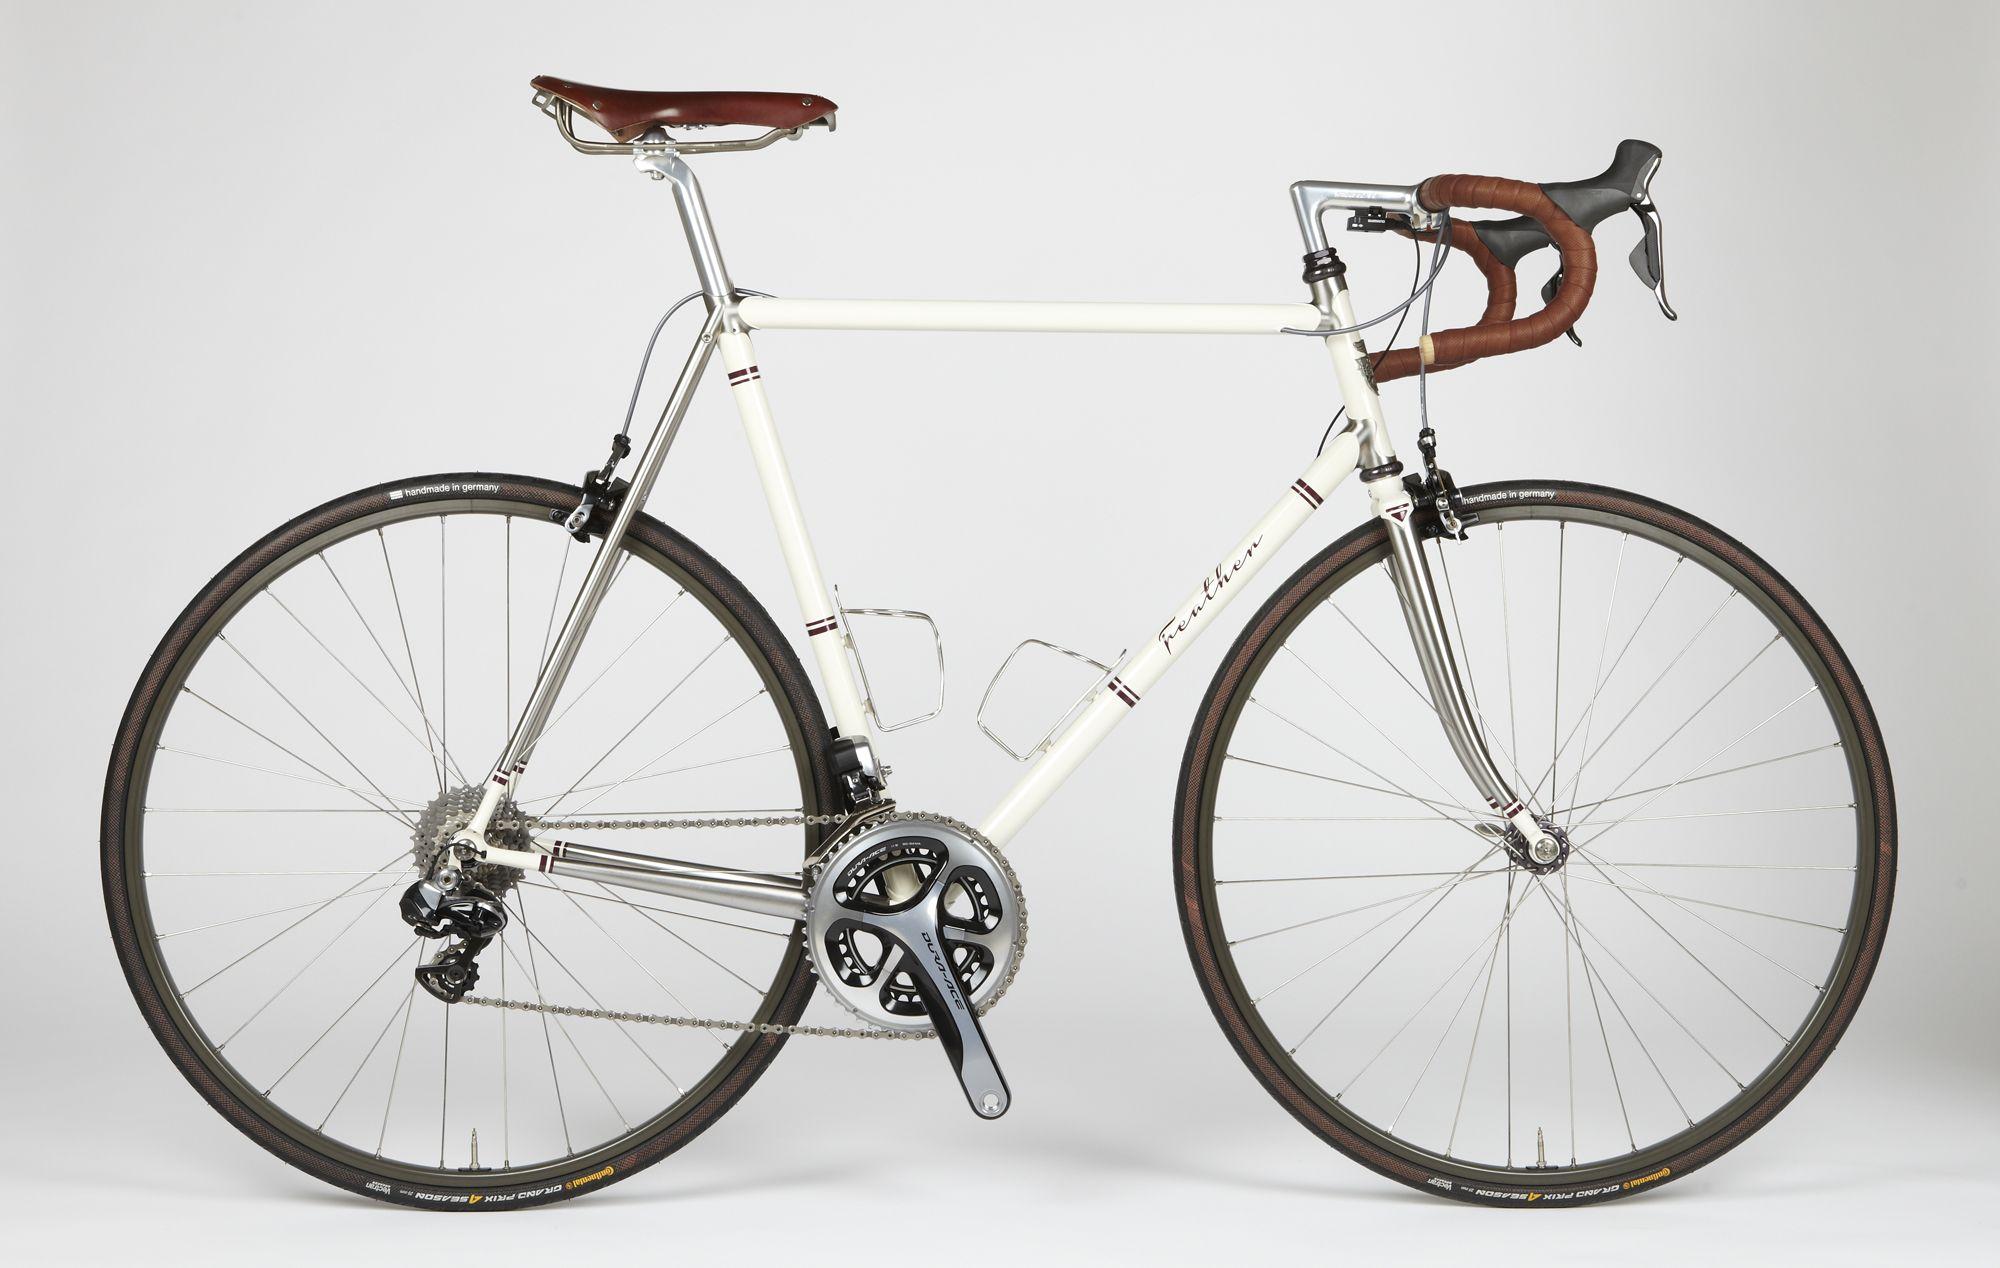 Feather Cycles Simon S Di2 Classic Road Bike Classic Road Bike Bike Riding Benefits Comfort Bike